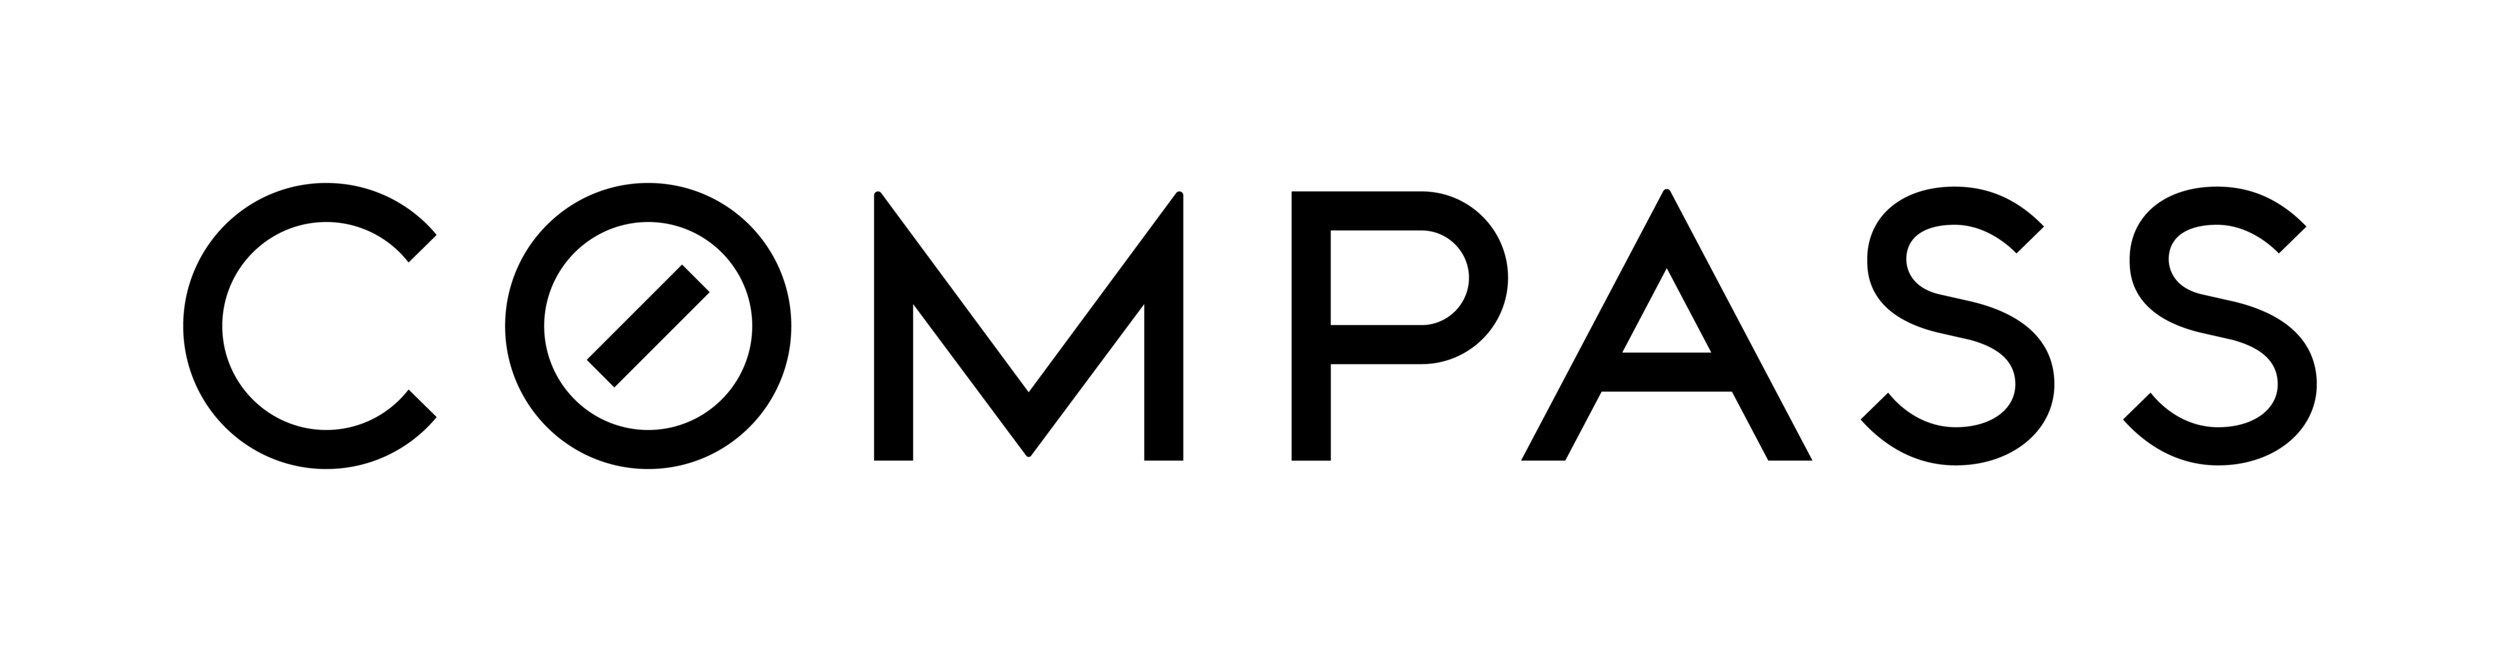 CompassLogo_Black-01 (1).png